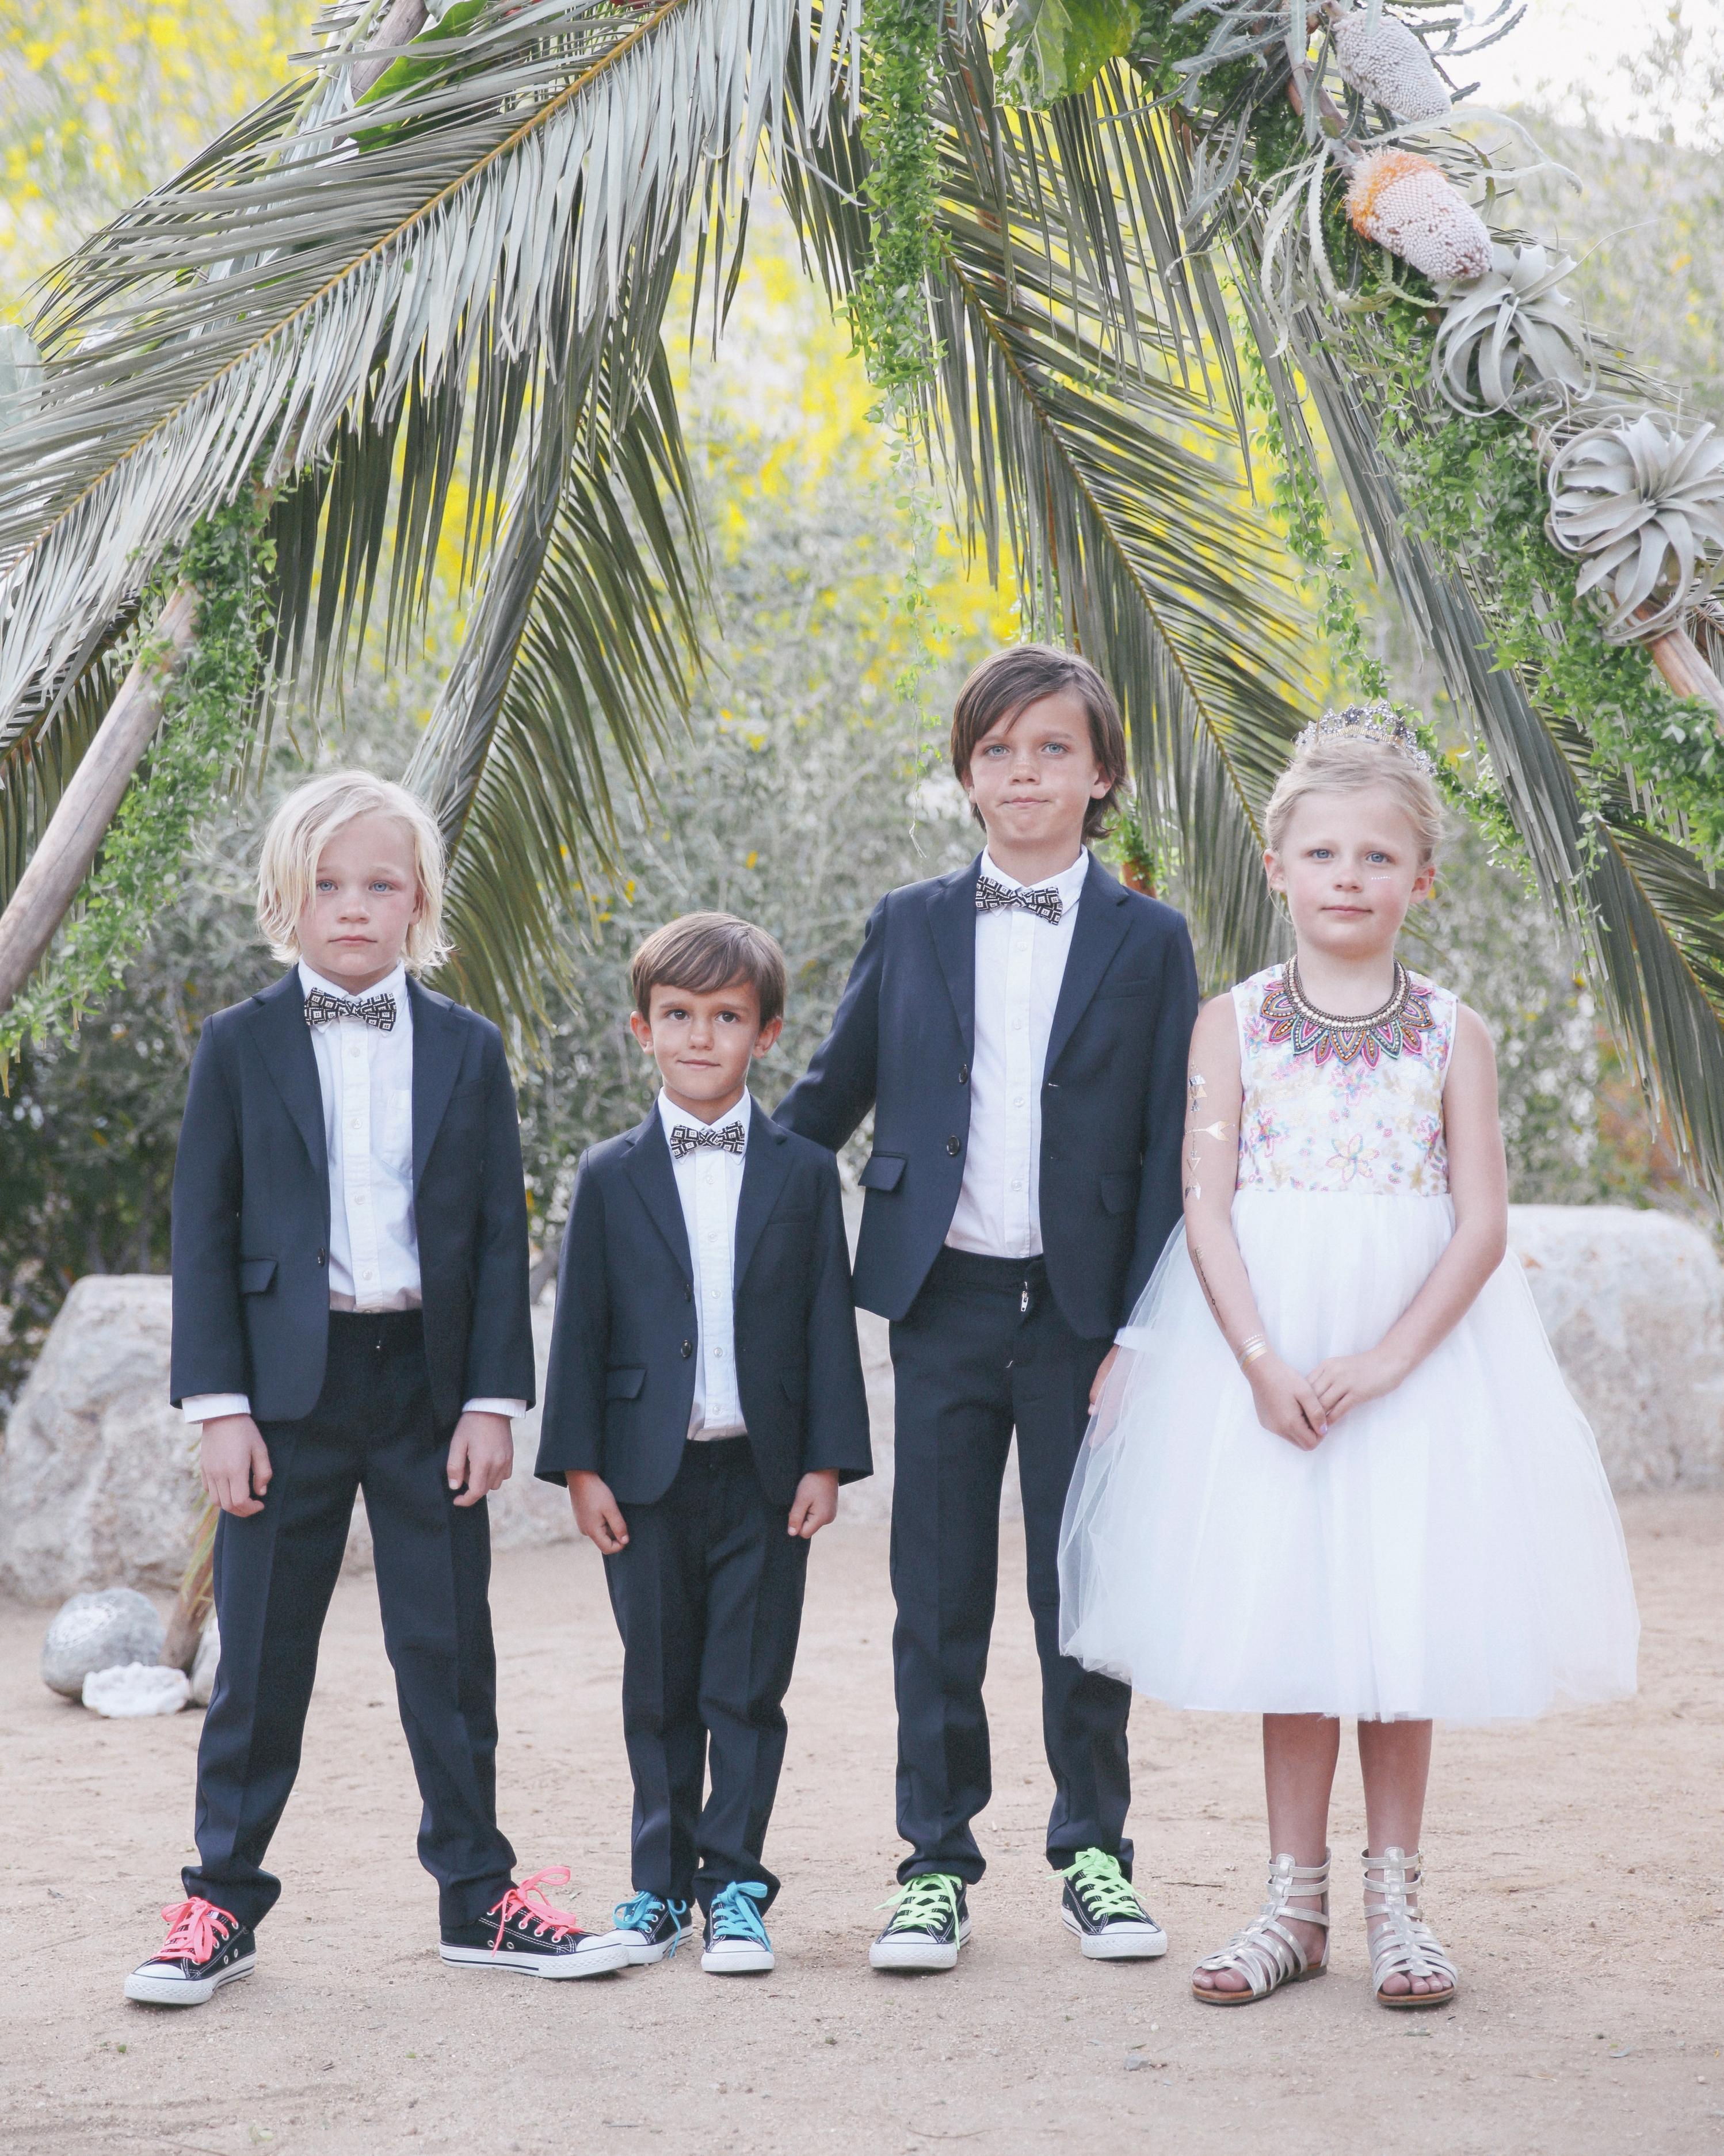 christen-billy-party-kids-261-011-s111597-1014.jpg